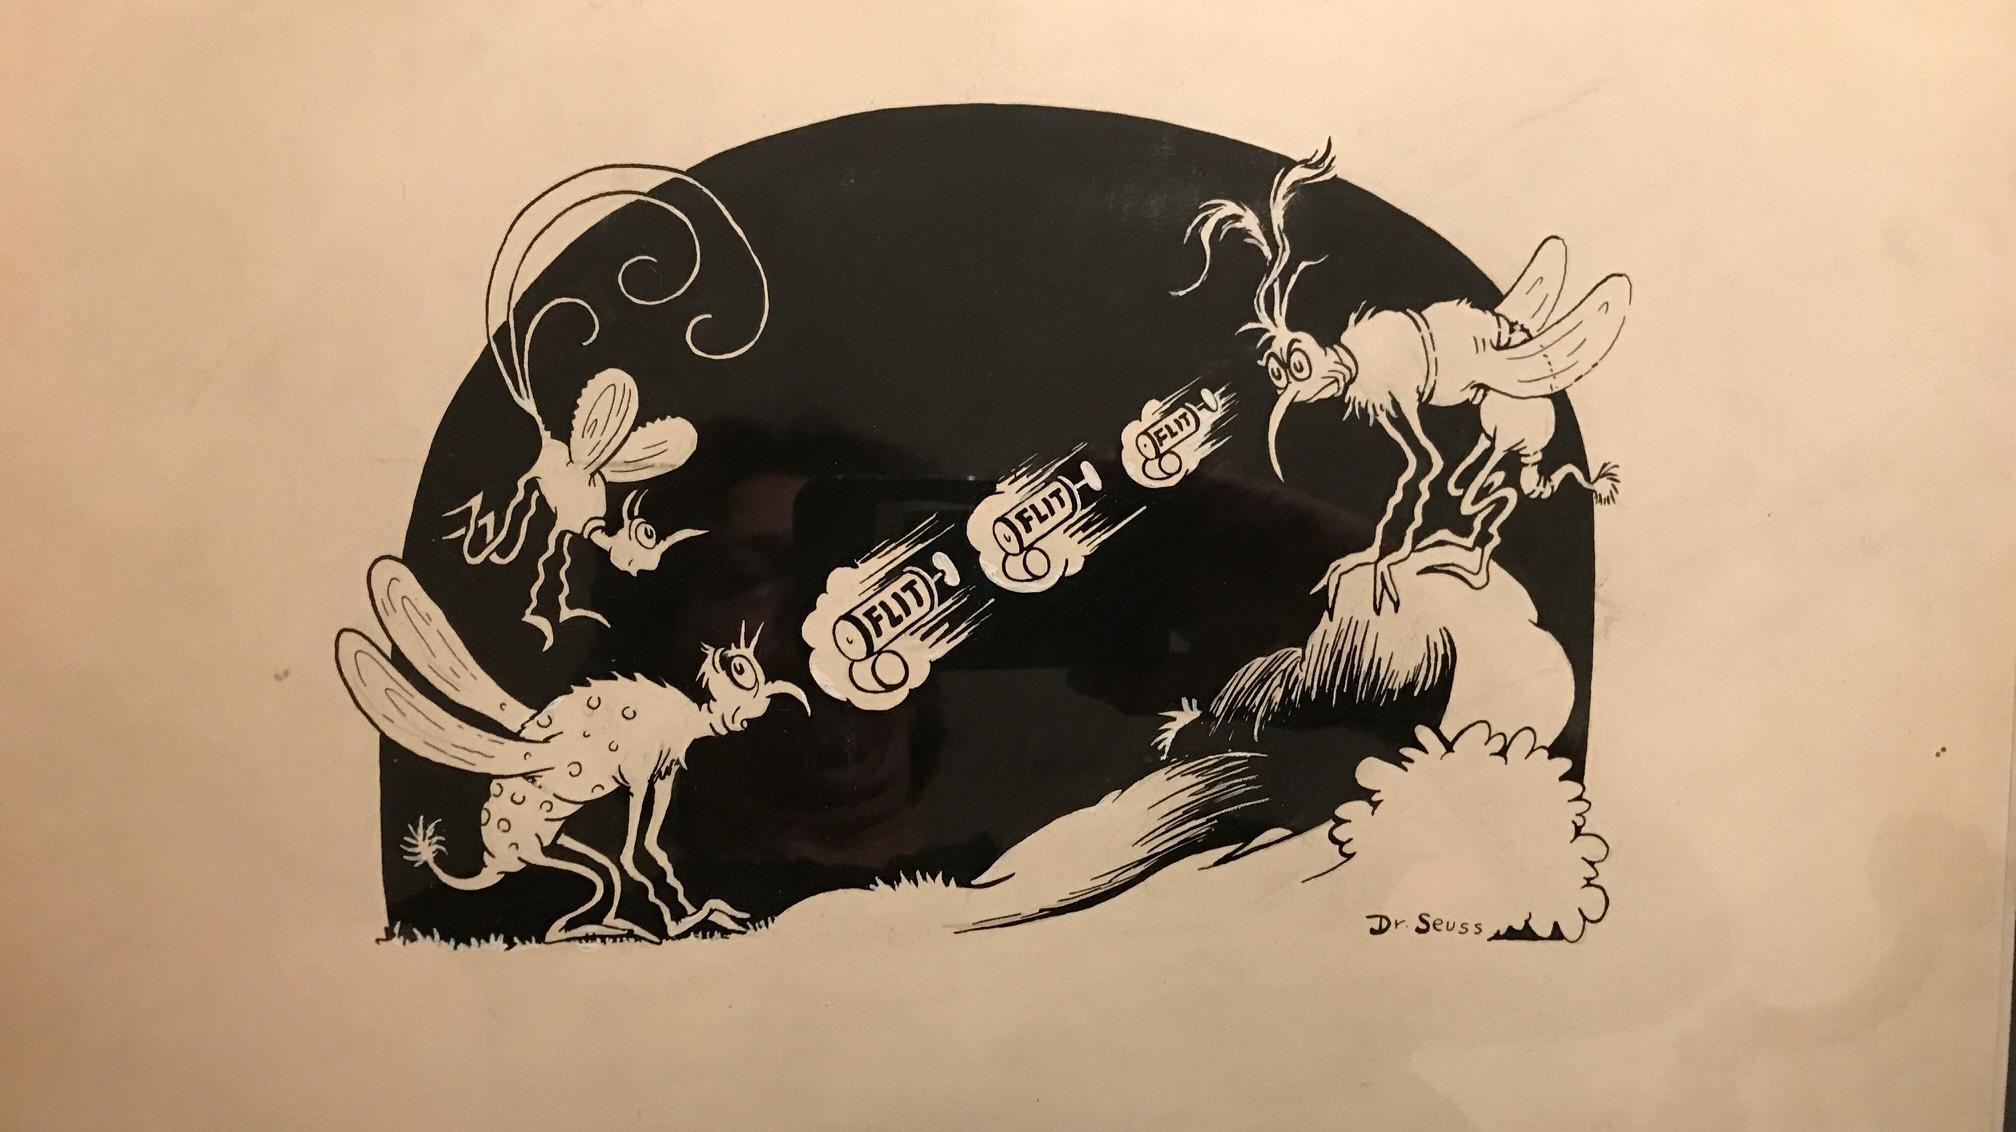 Dr. Seuss (Theodor Geisel)   Flit   10.5 x 15.5 in.